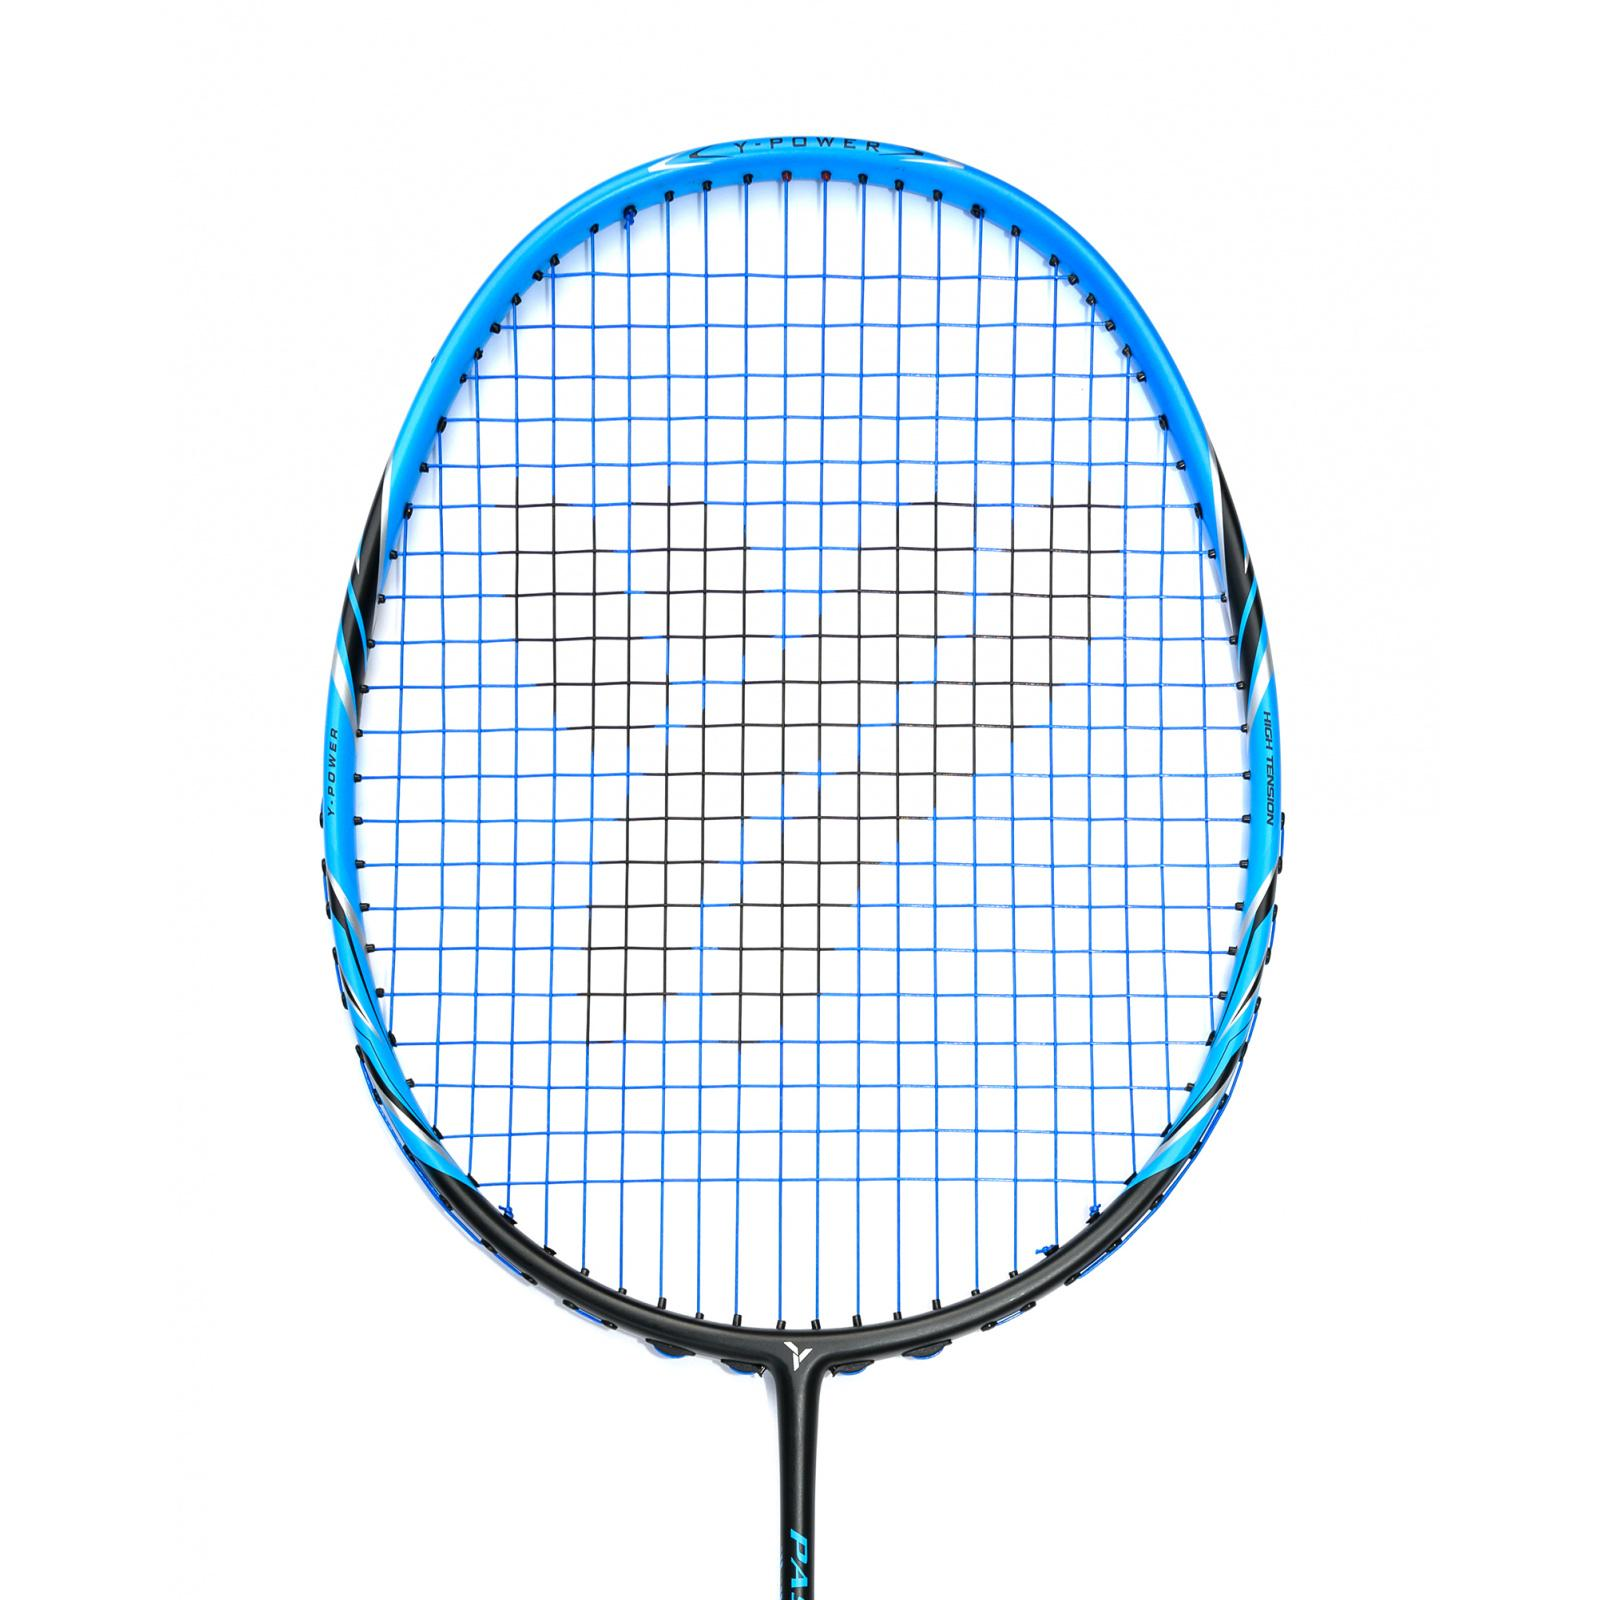 https://www.badec.store/produkty_img/badmintonova-raketa1569328269L.jpg